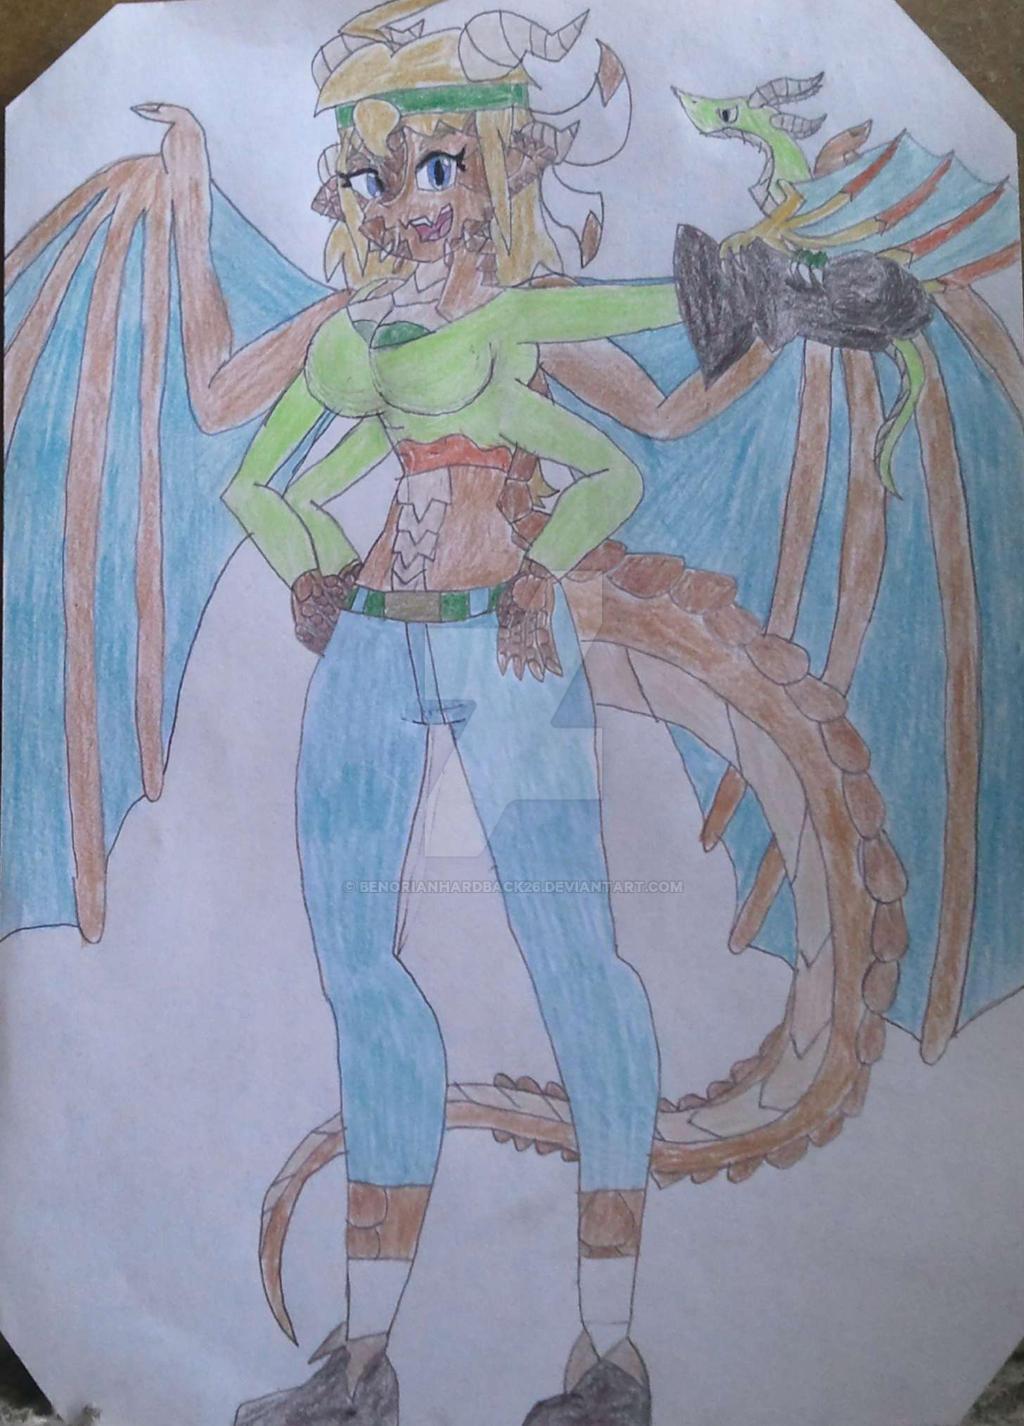 Railey Hardback (Shantae style) by BenorianHardback26